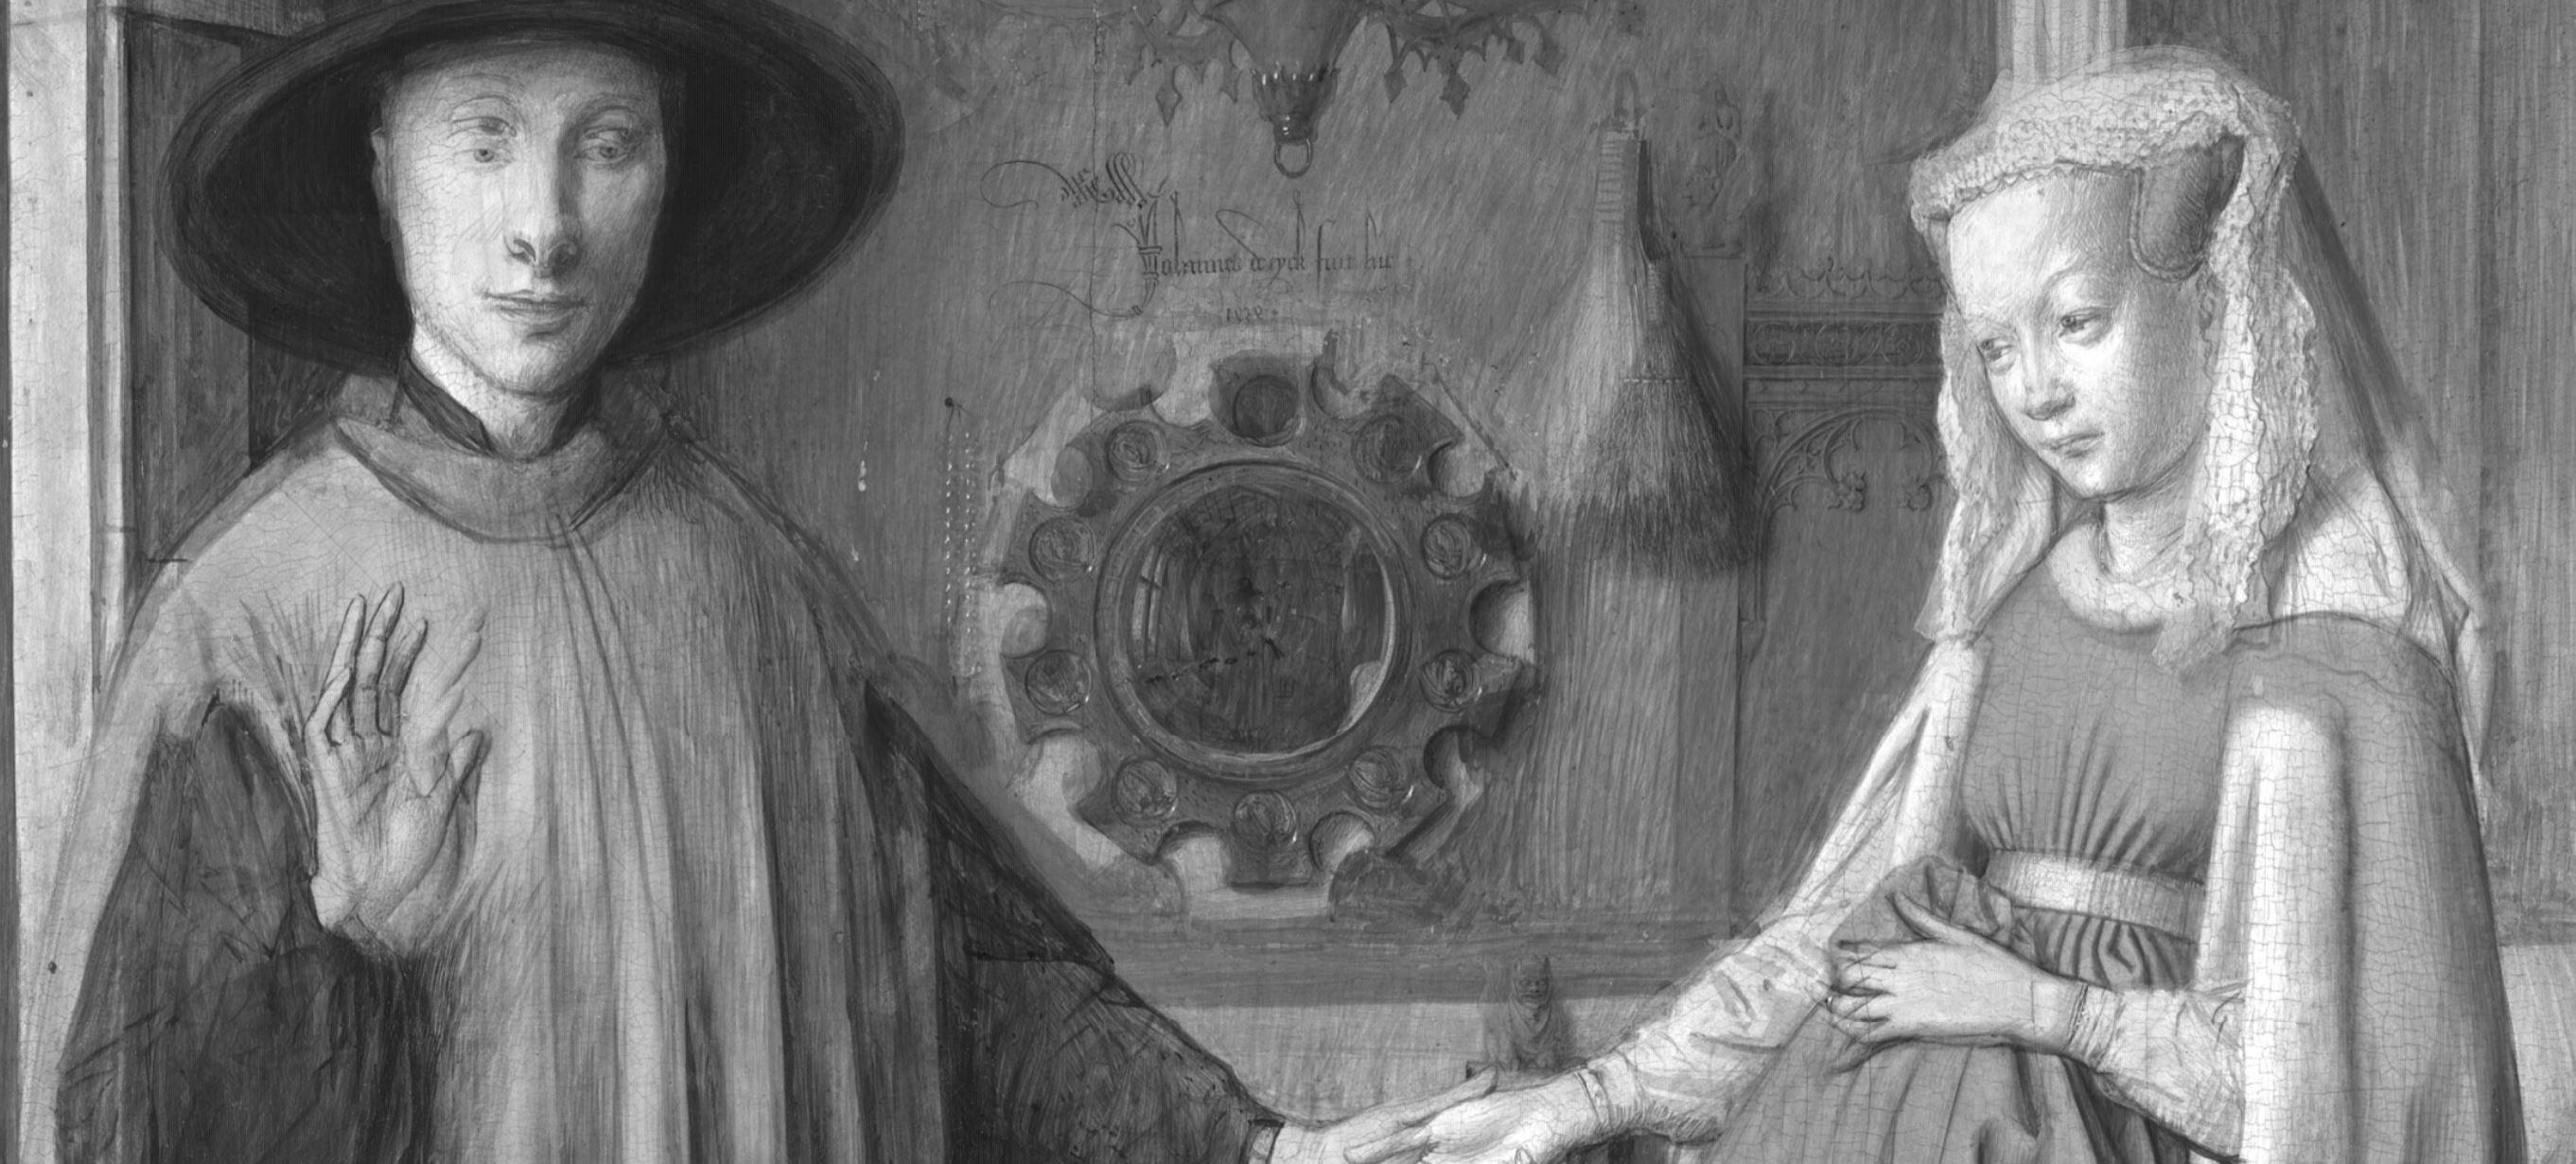 Van_Eyck 1434 _Arnolfini_Portrait radiographie